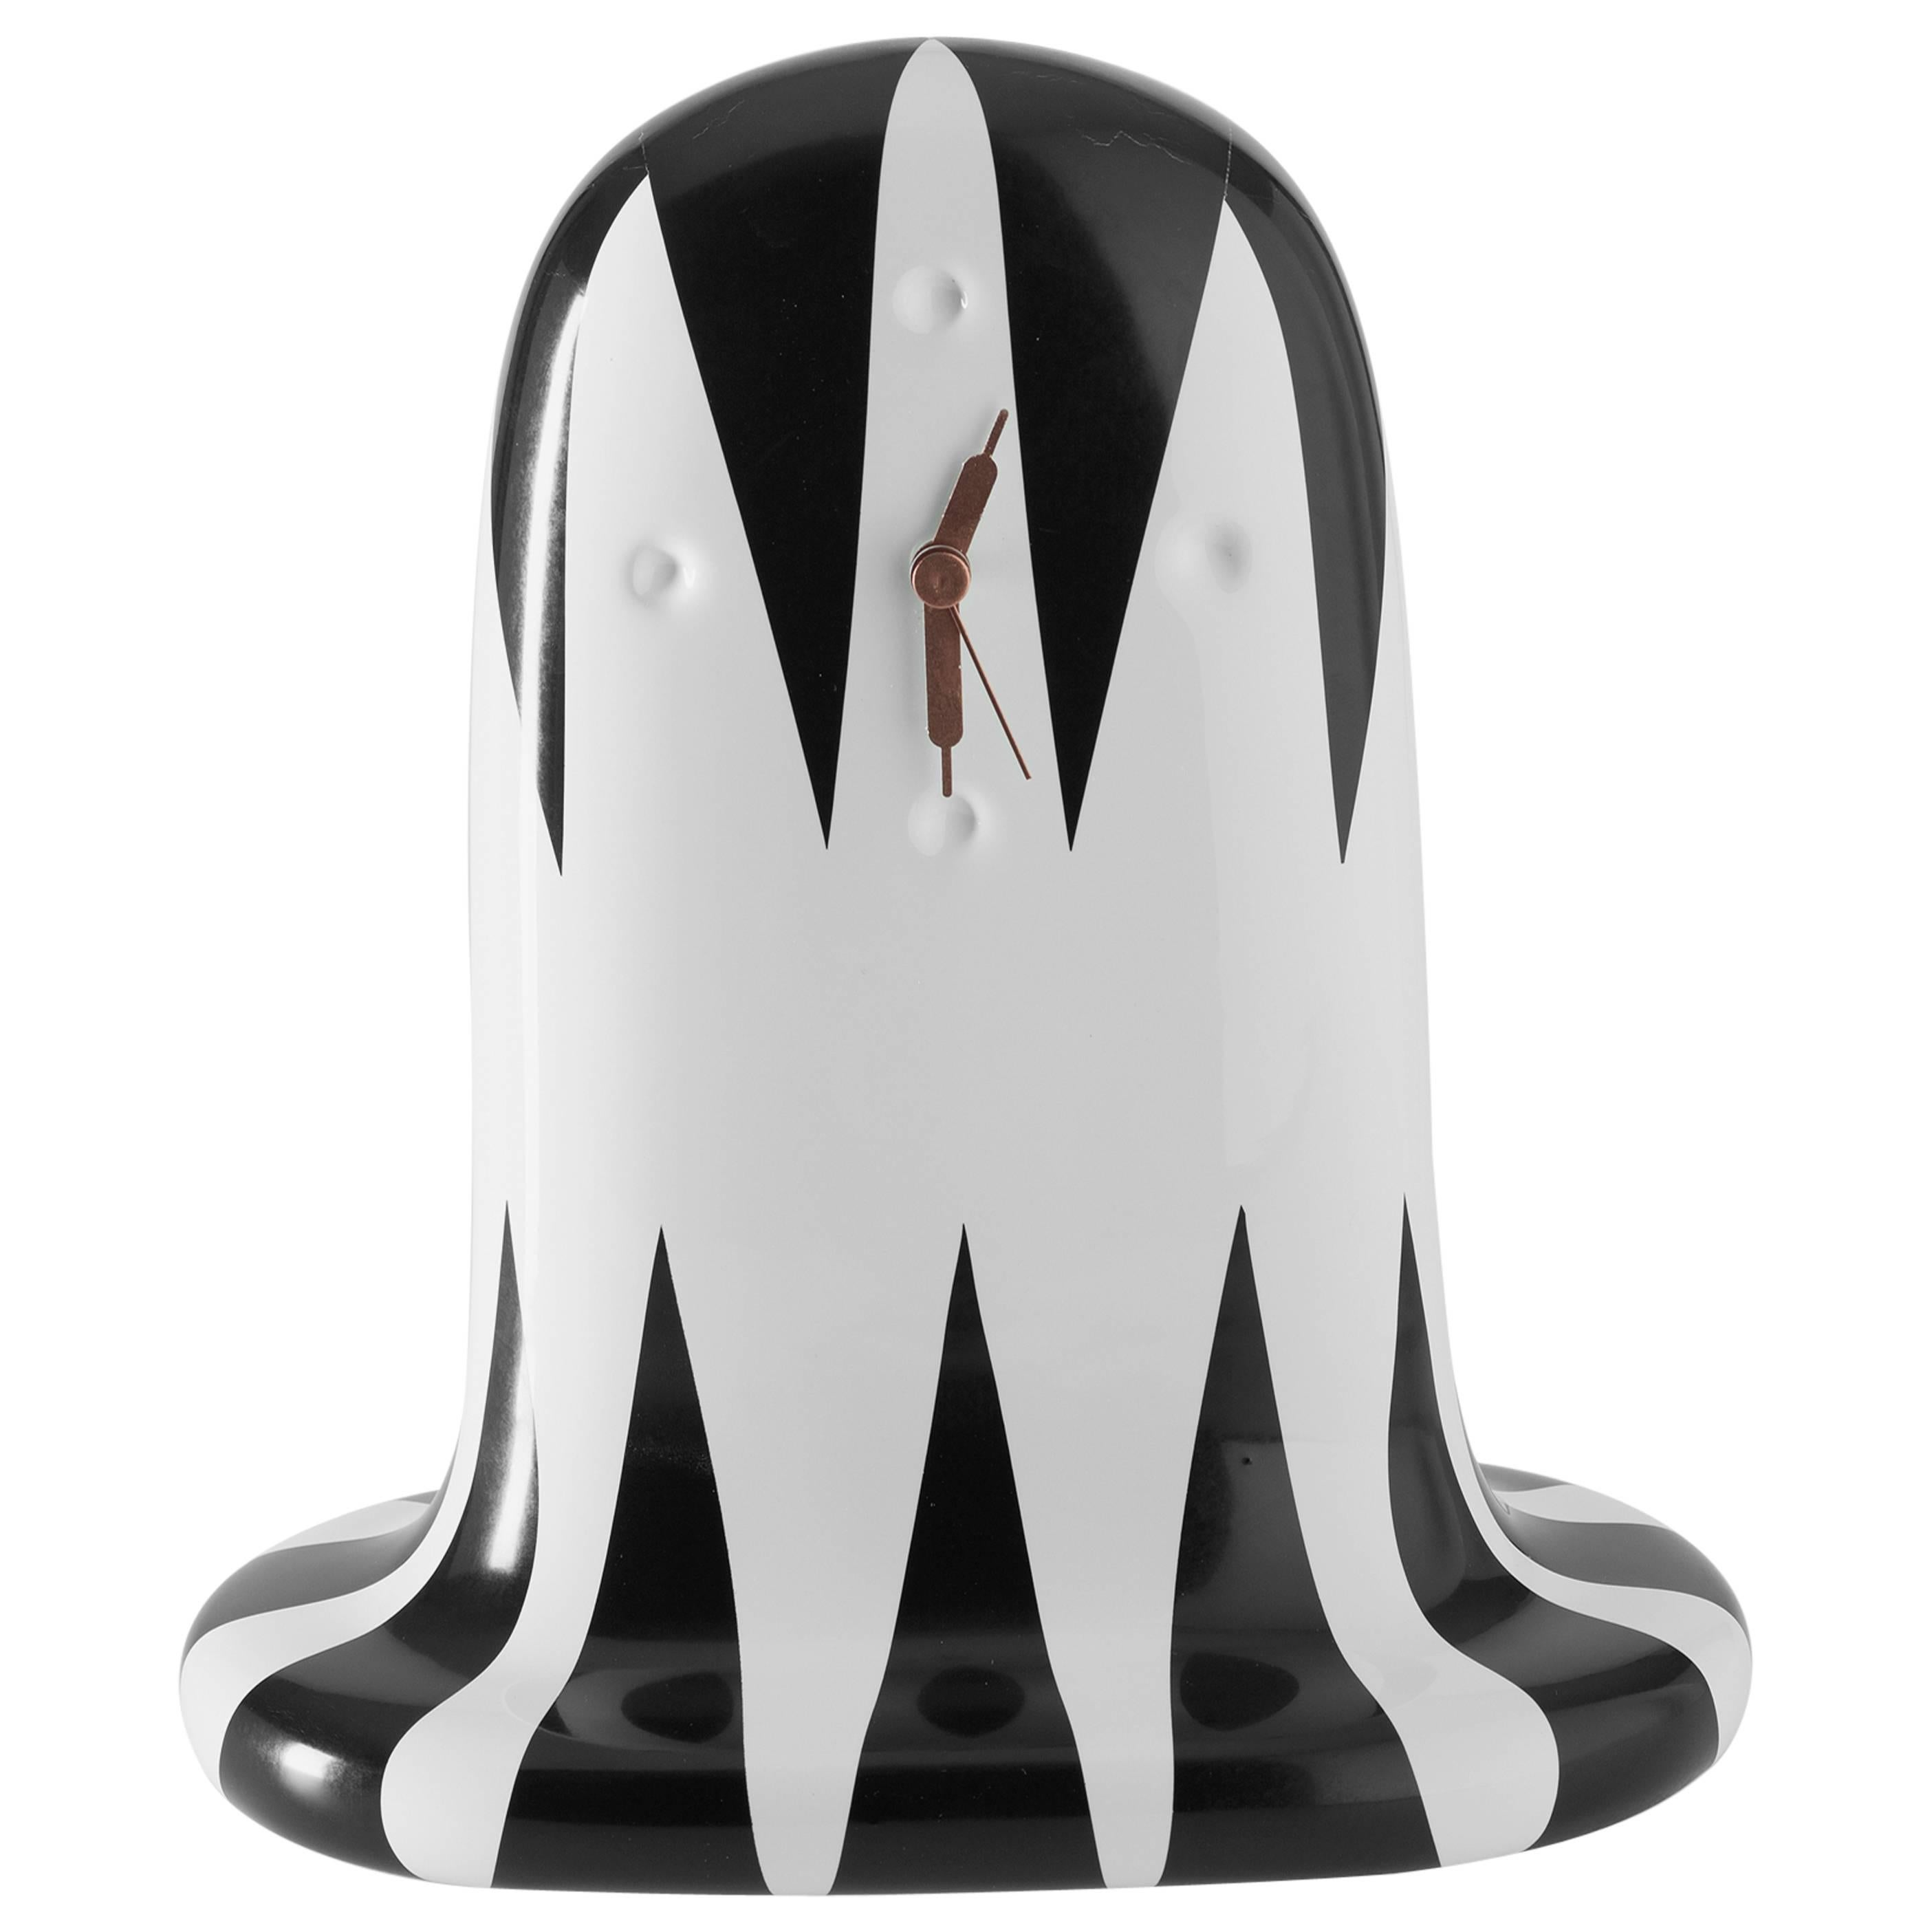 Fantasmiko Table Clock Special Edition Diamond Designed by Jaime Hayon